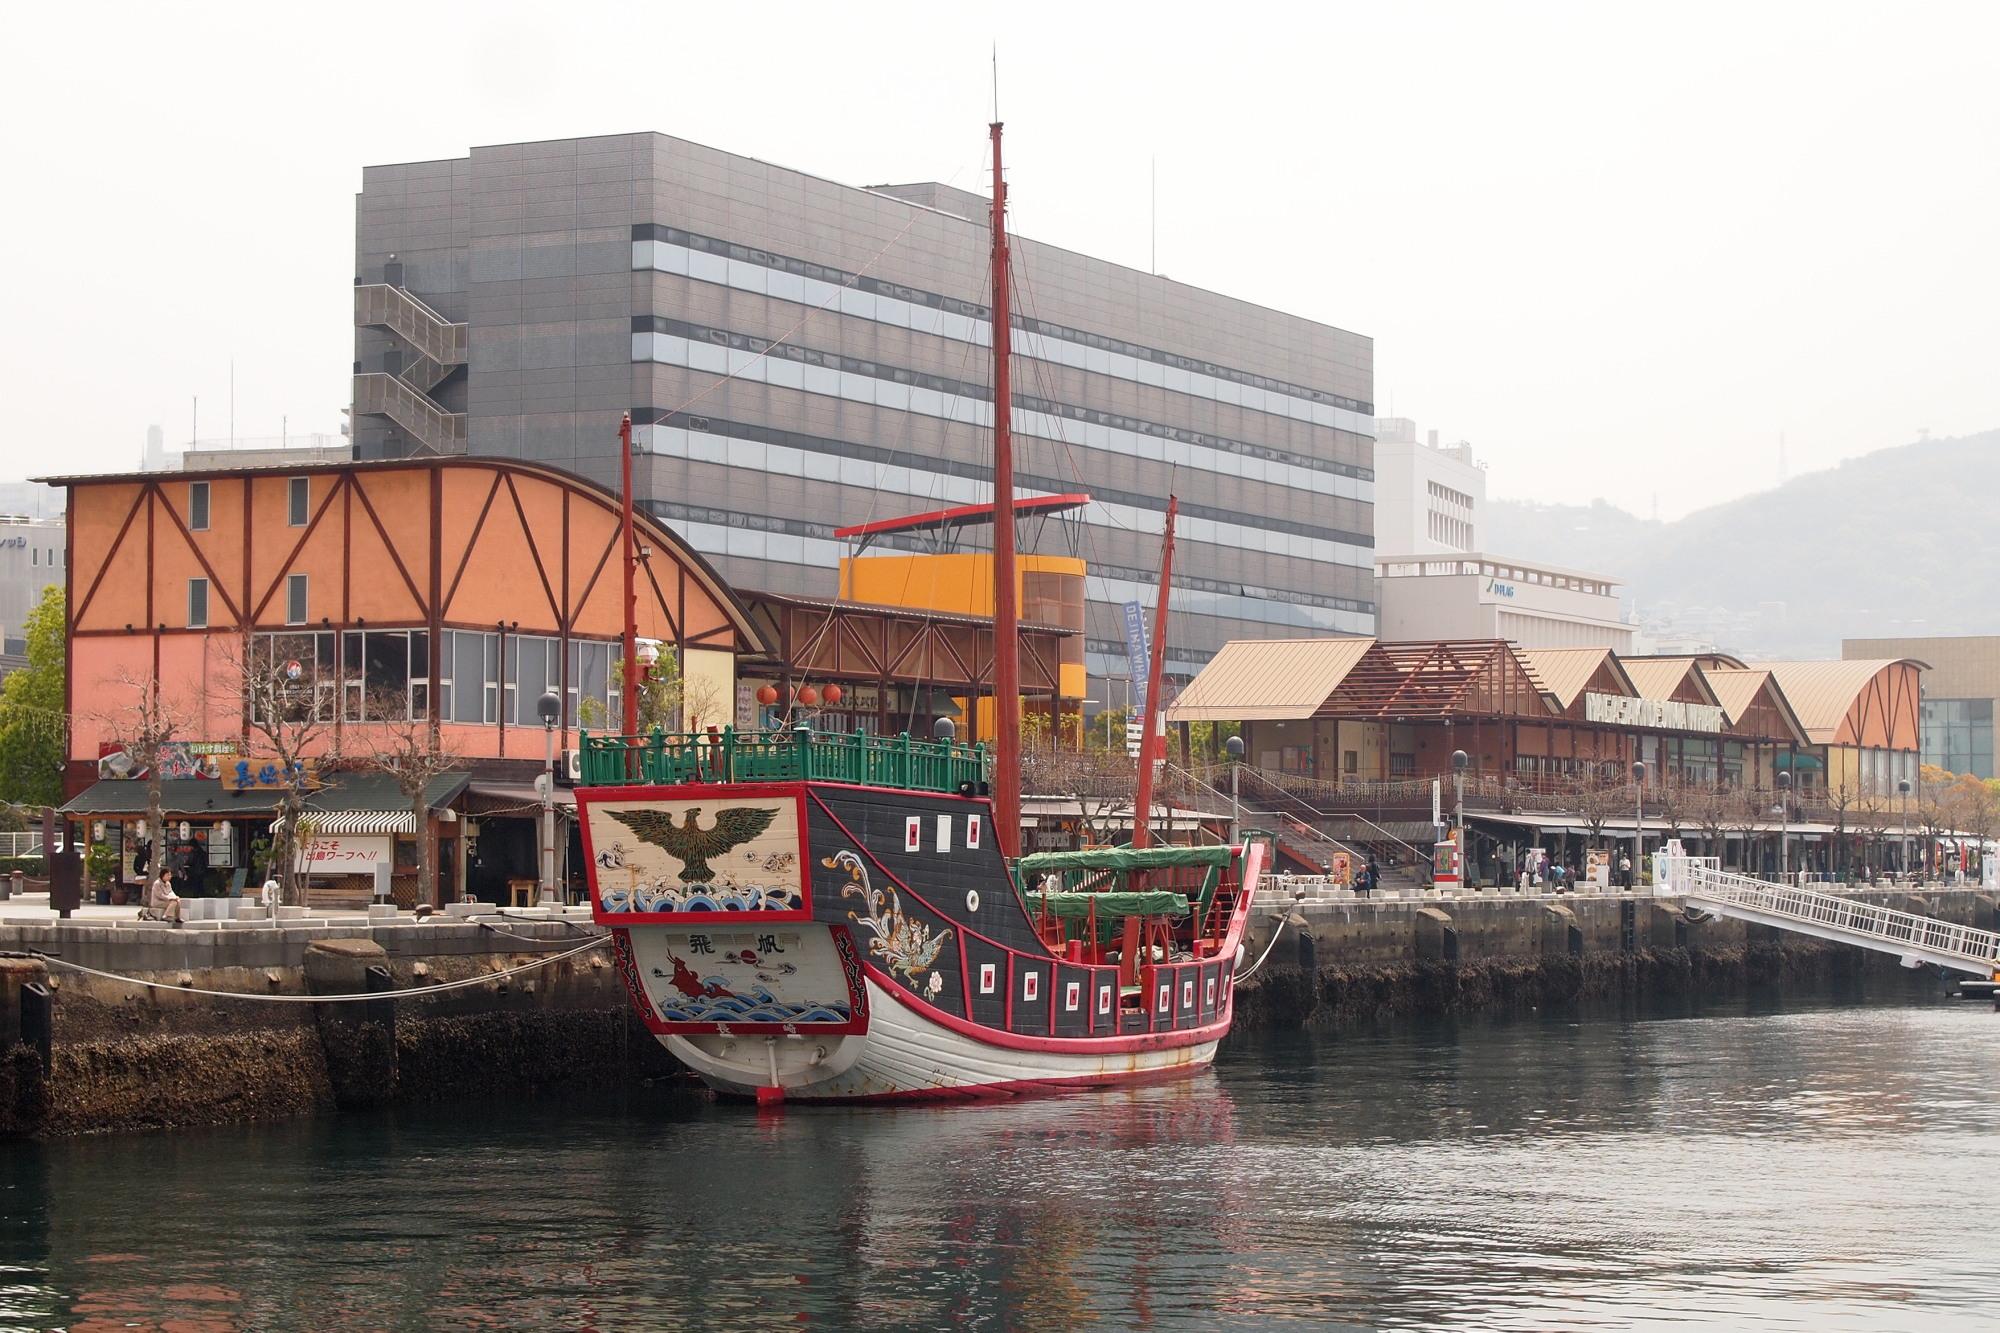 File:Nagasaki Dejima wharf 2011.jpg - Wikimedia Commons